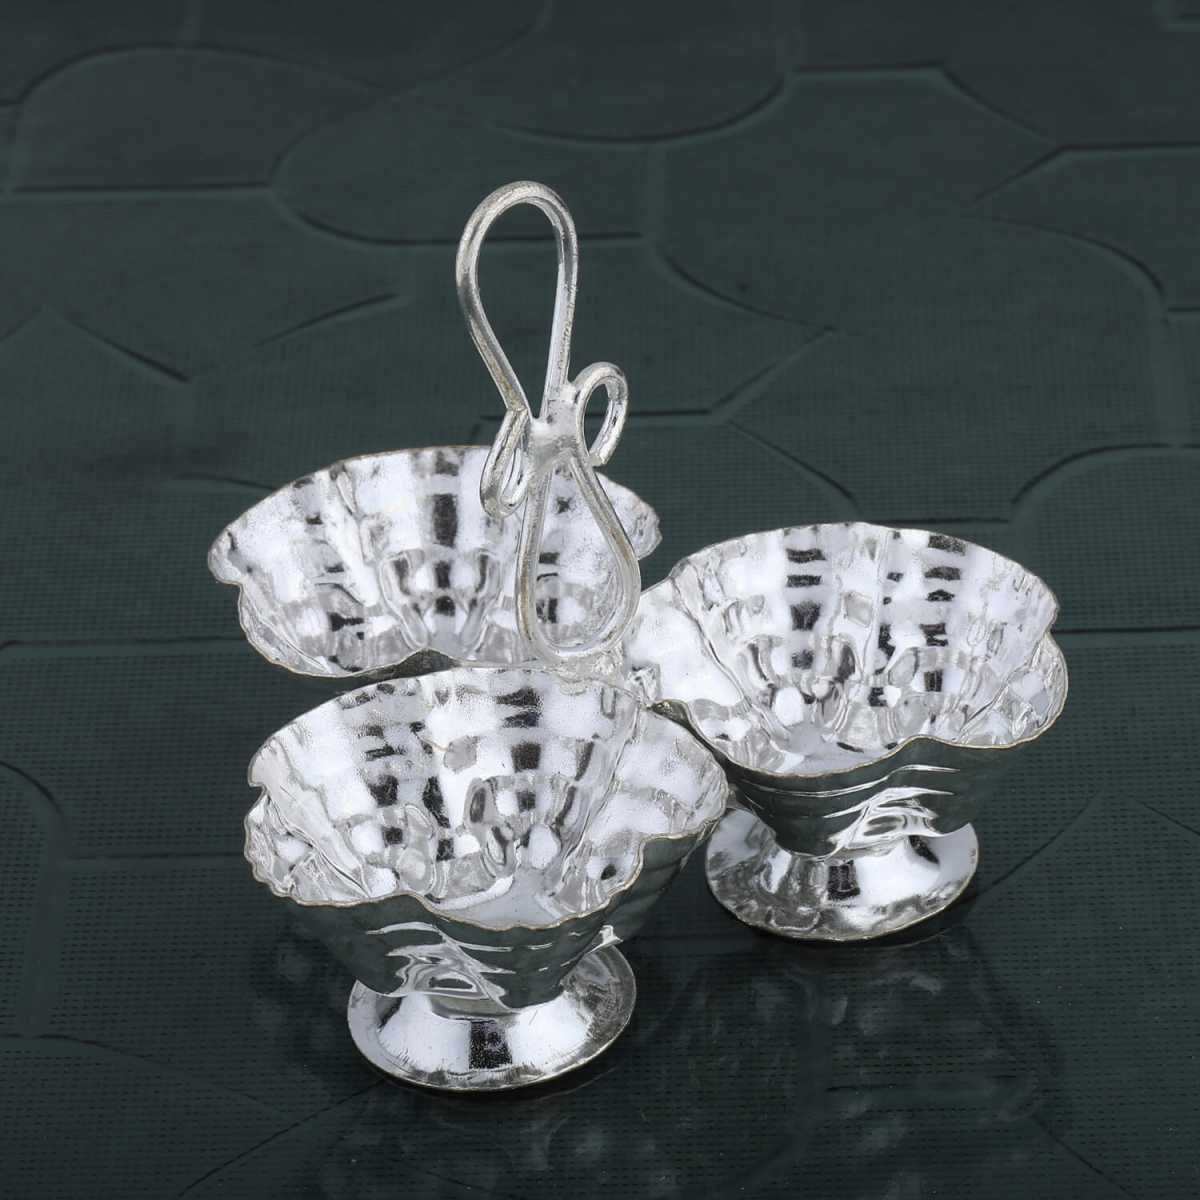 Silver Shine Silver Plated  Flower Design Kankavati/Sindoor Stand  Set of 1